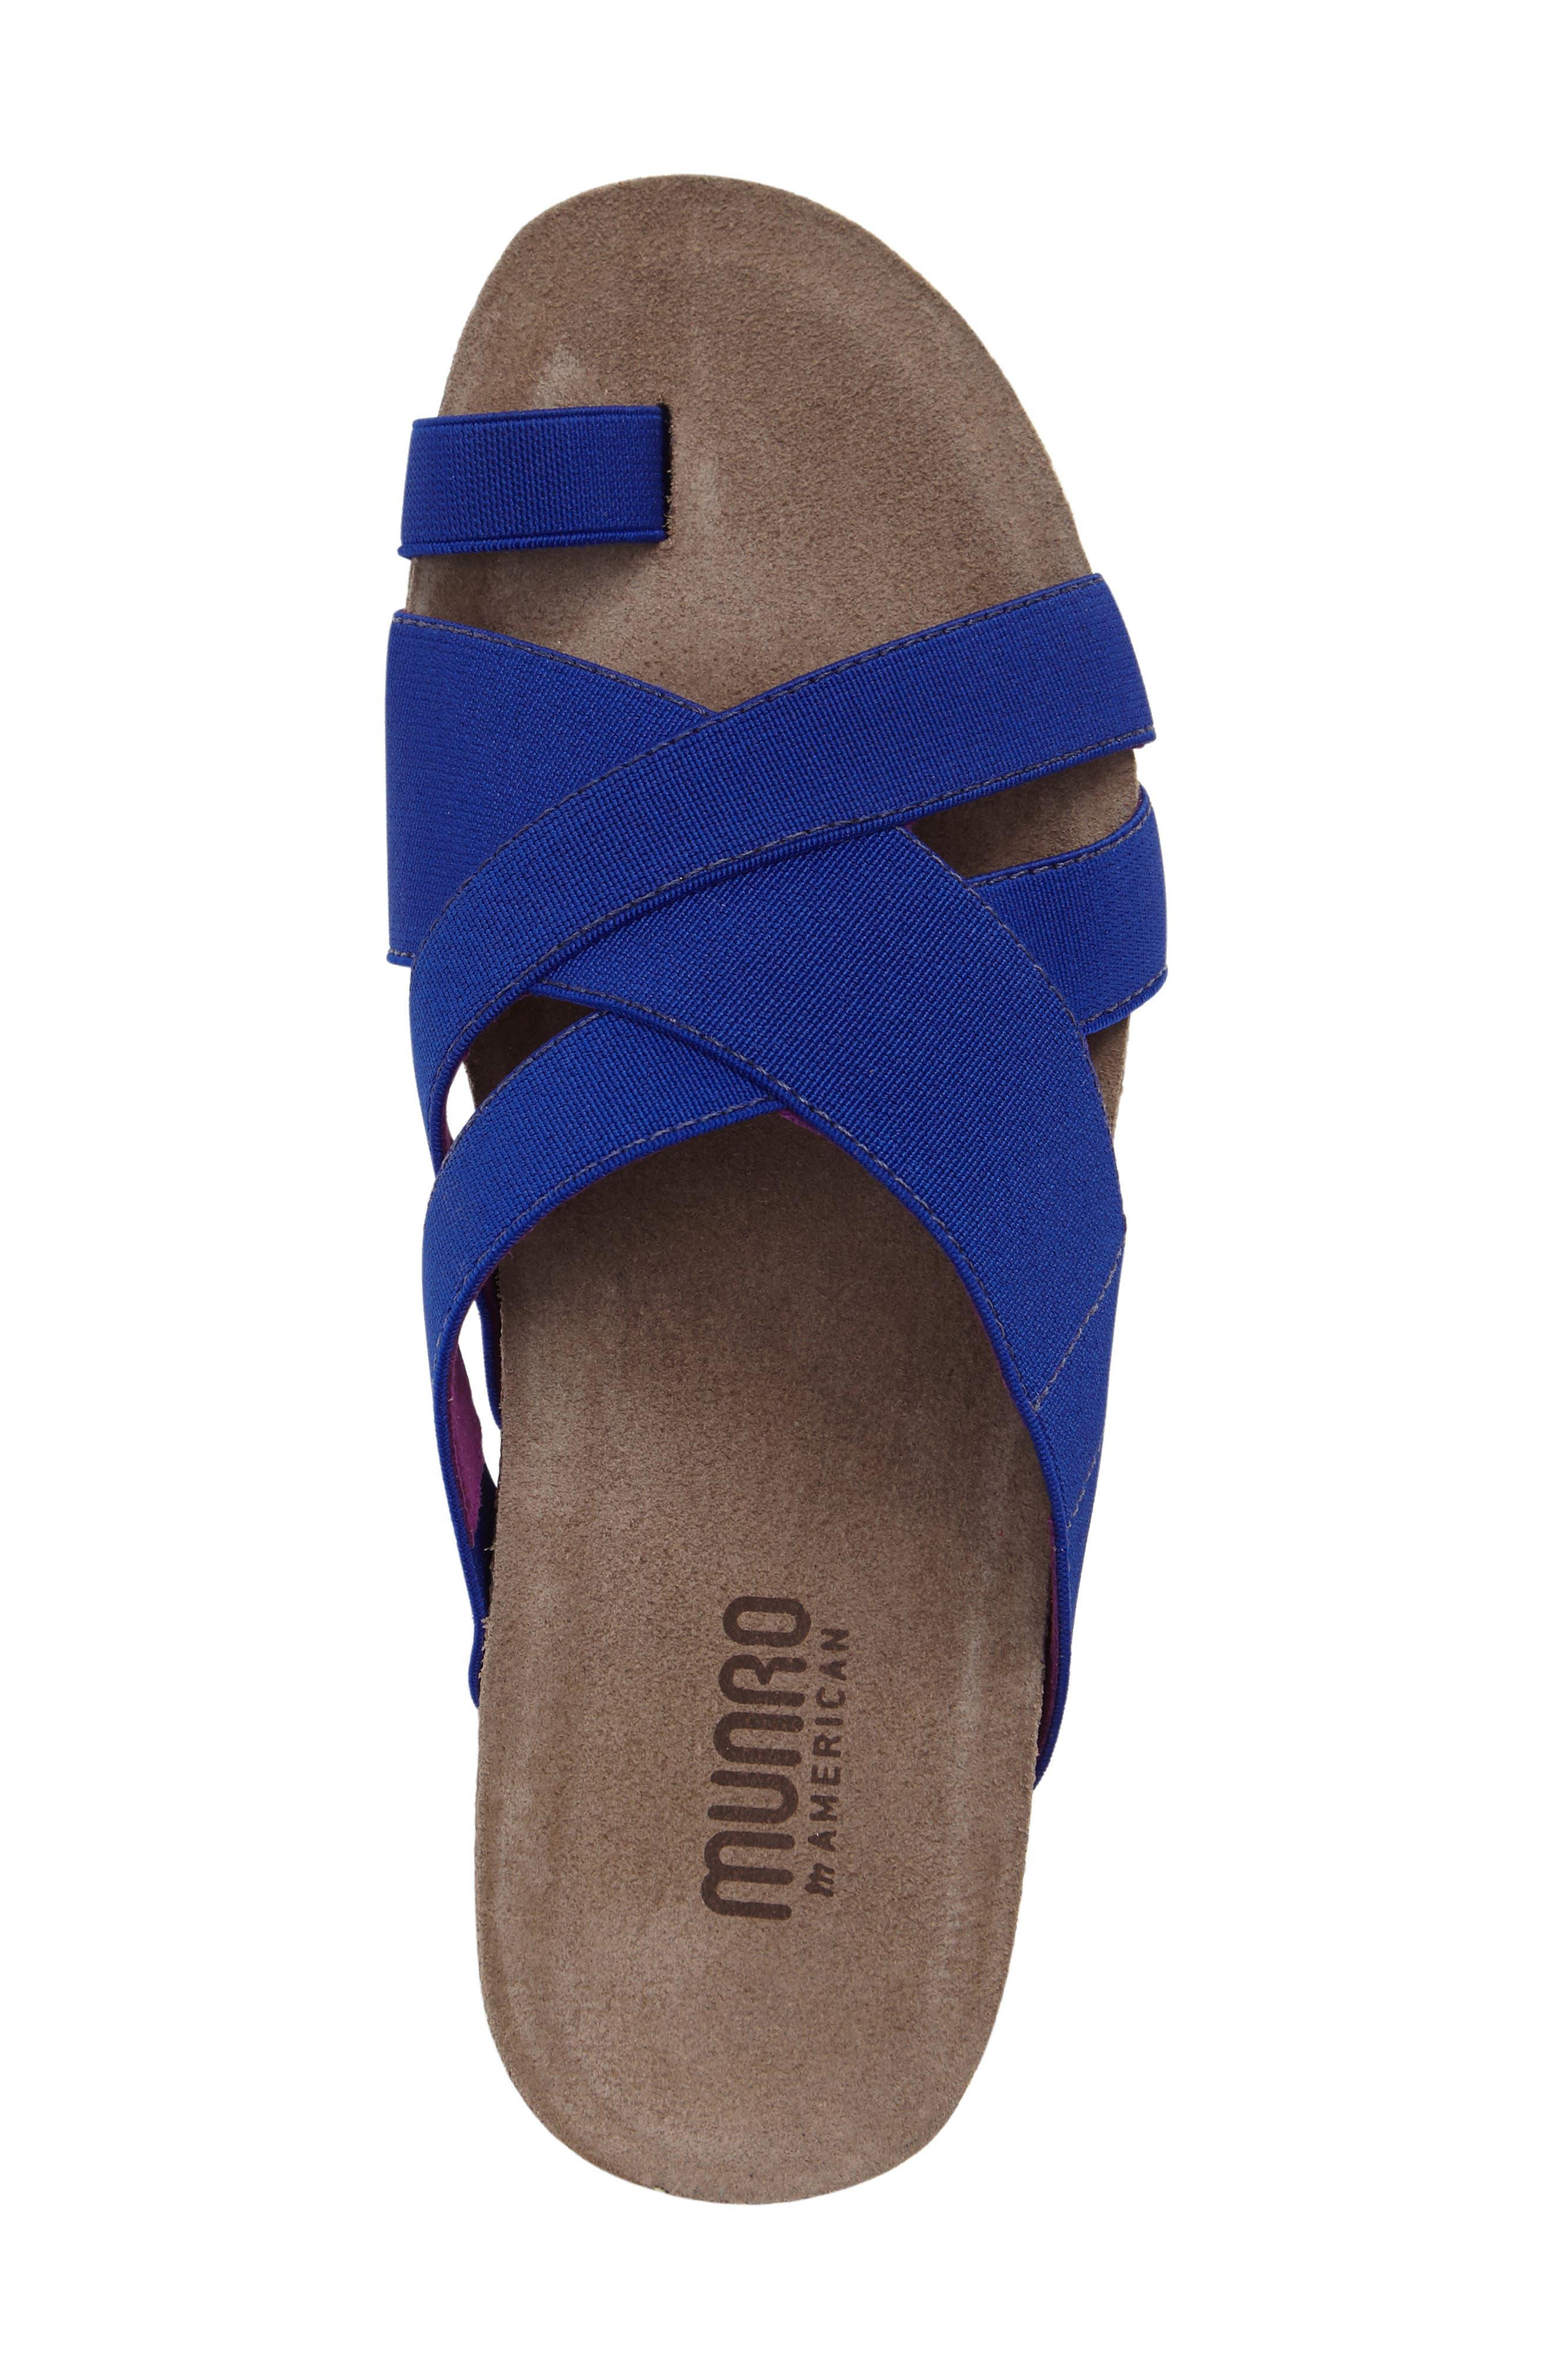 Delphi Slide Sandal,                             Alternate thumbnail 5, color,                             Blue Fabric